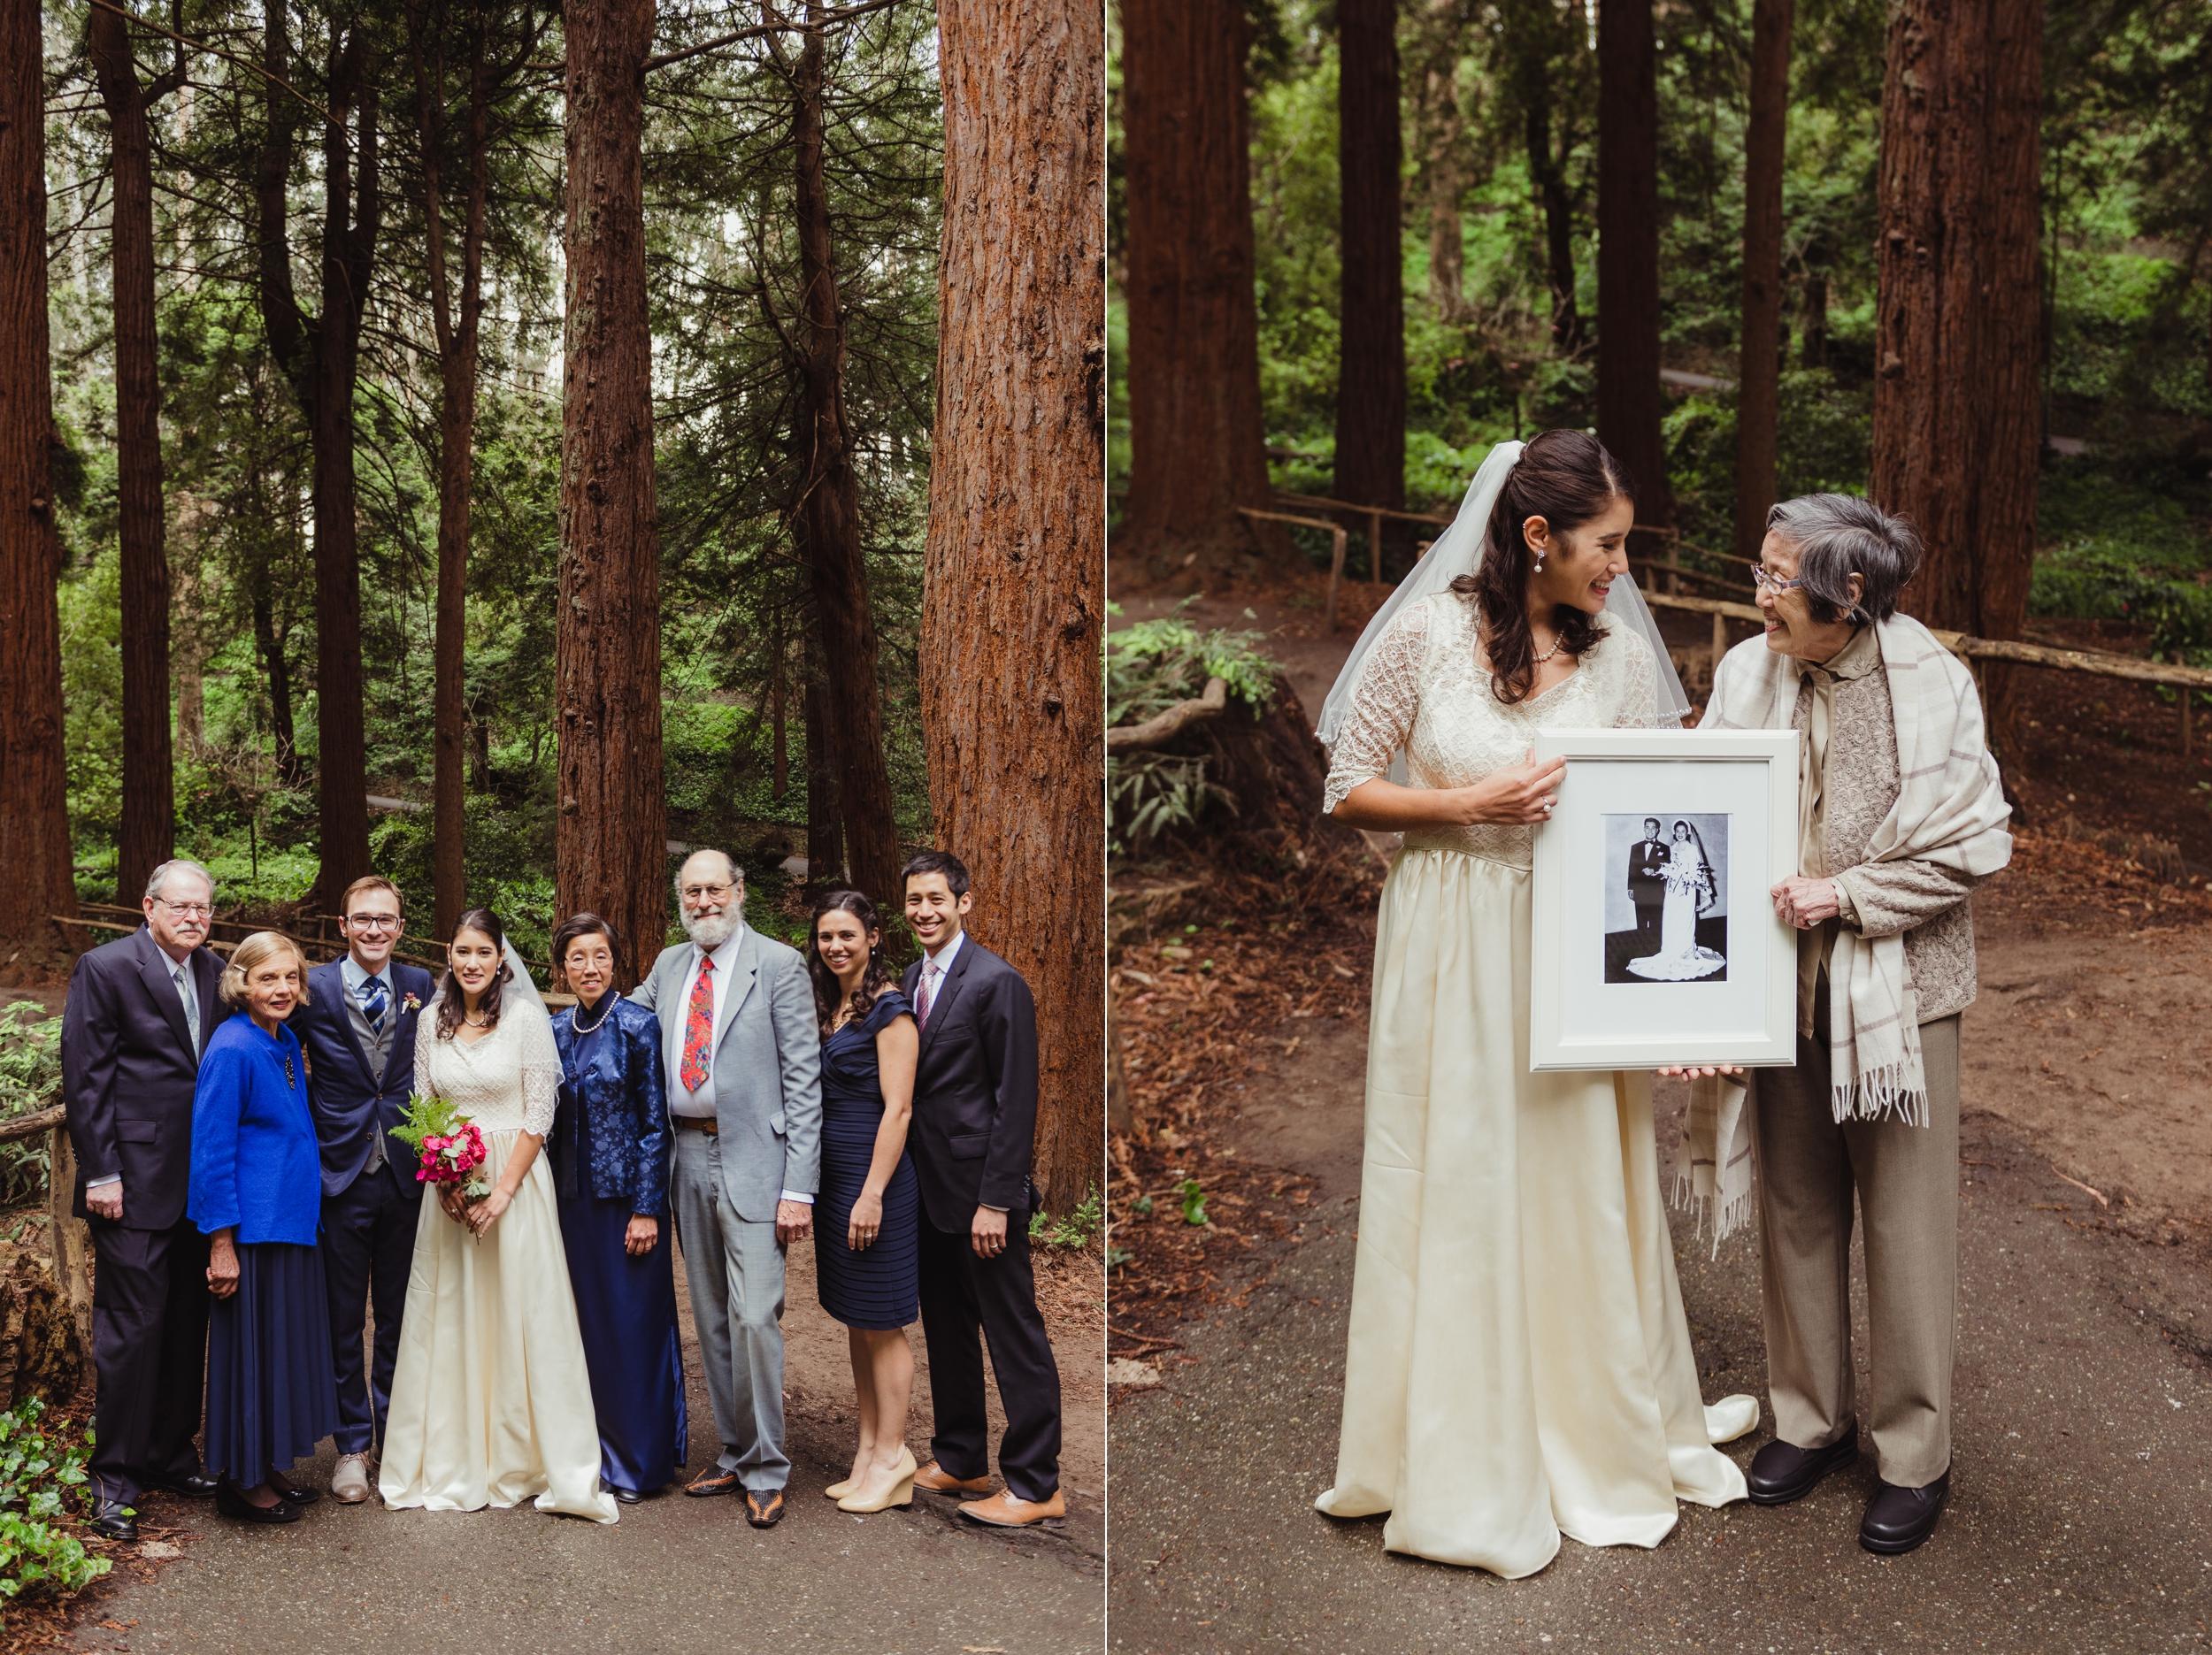 17vintage-san-francisco-stern-grove-wedding-vivianchen-0206_WEB.jpg